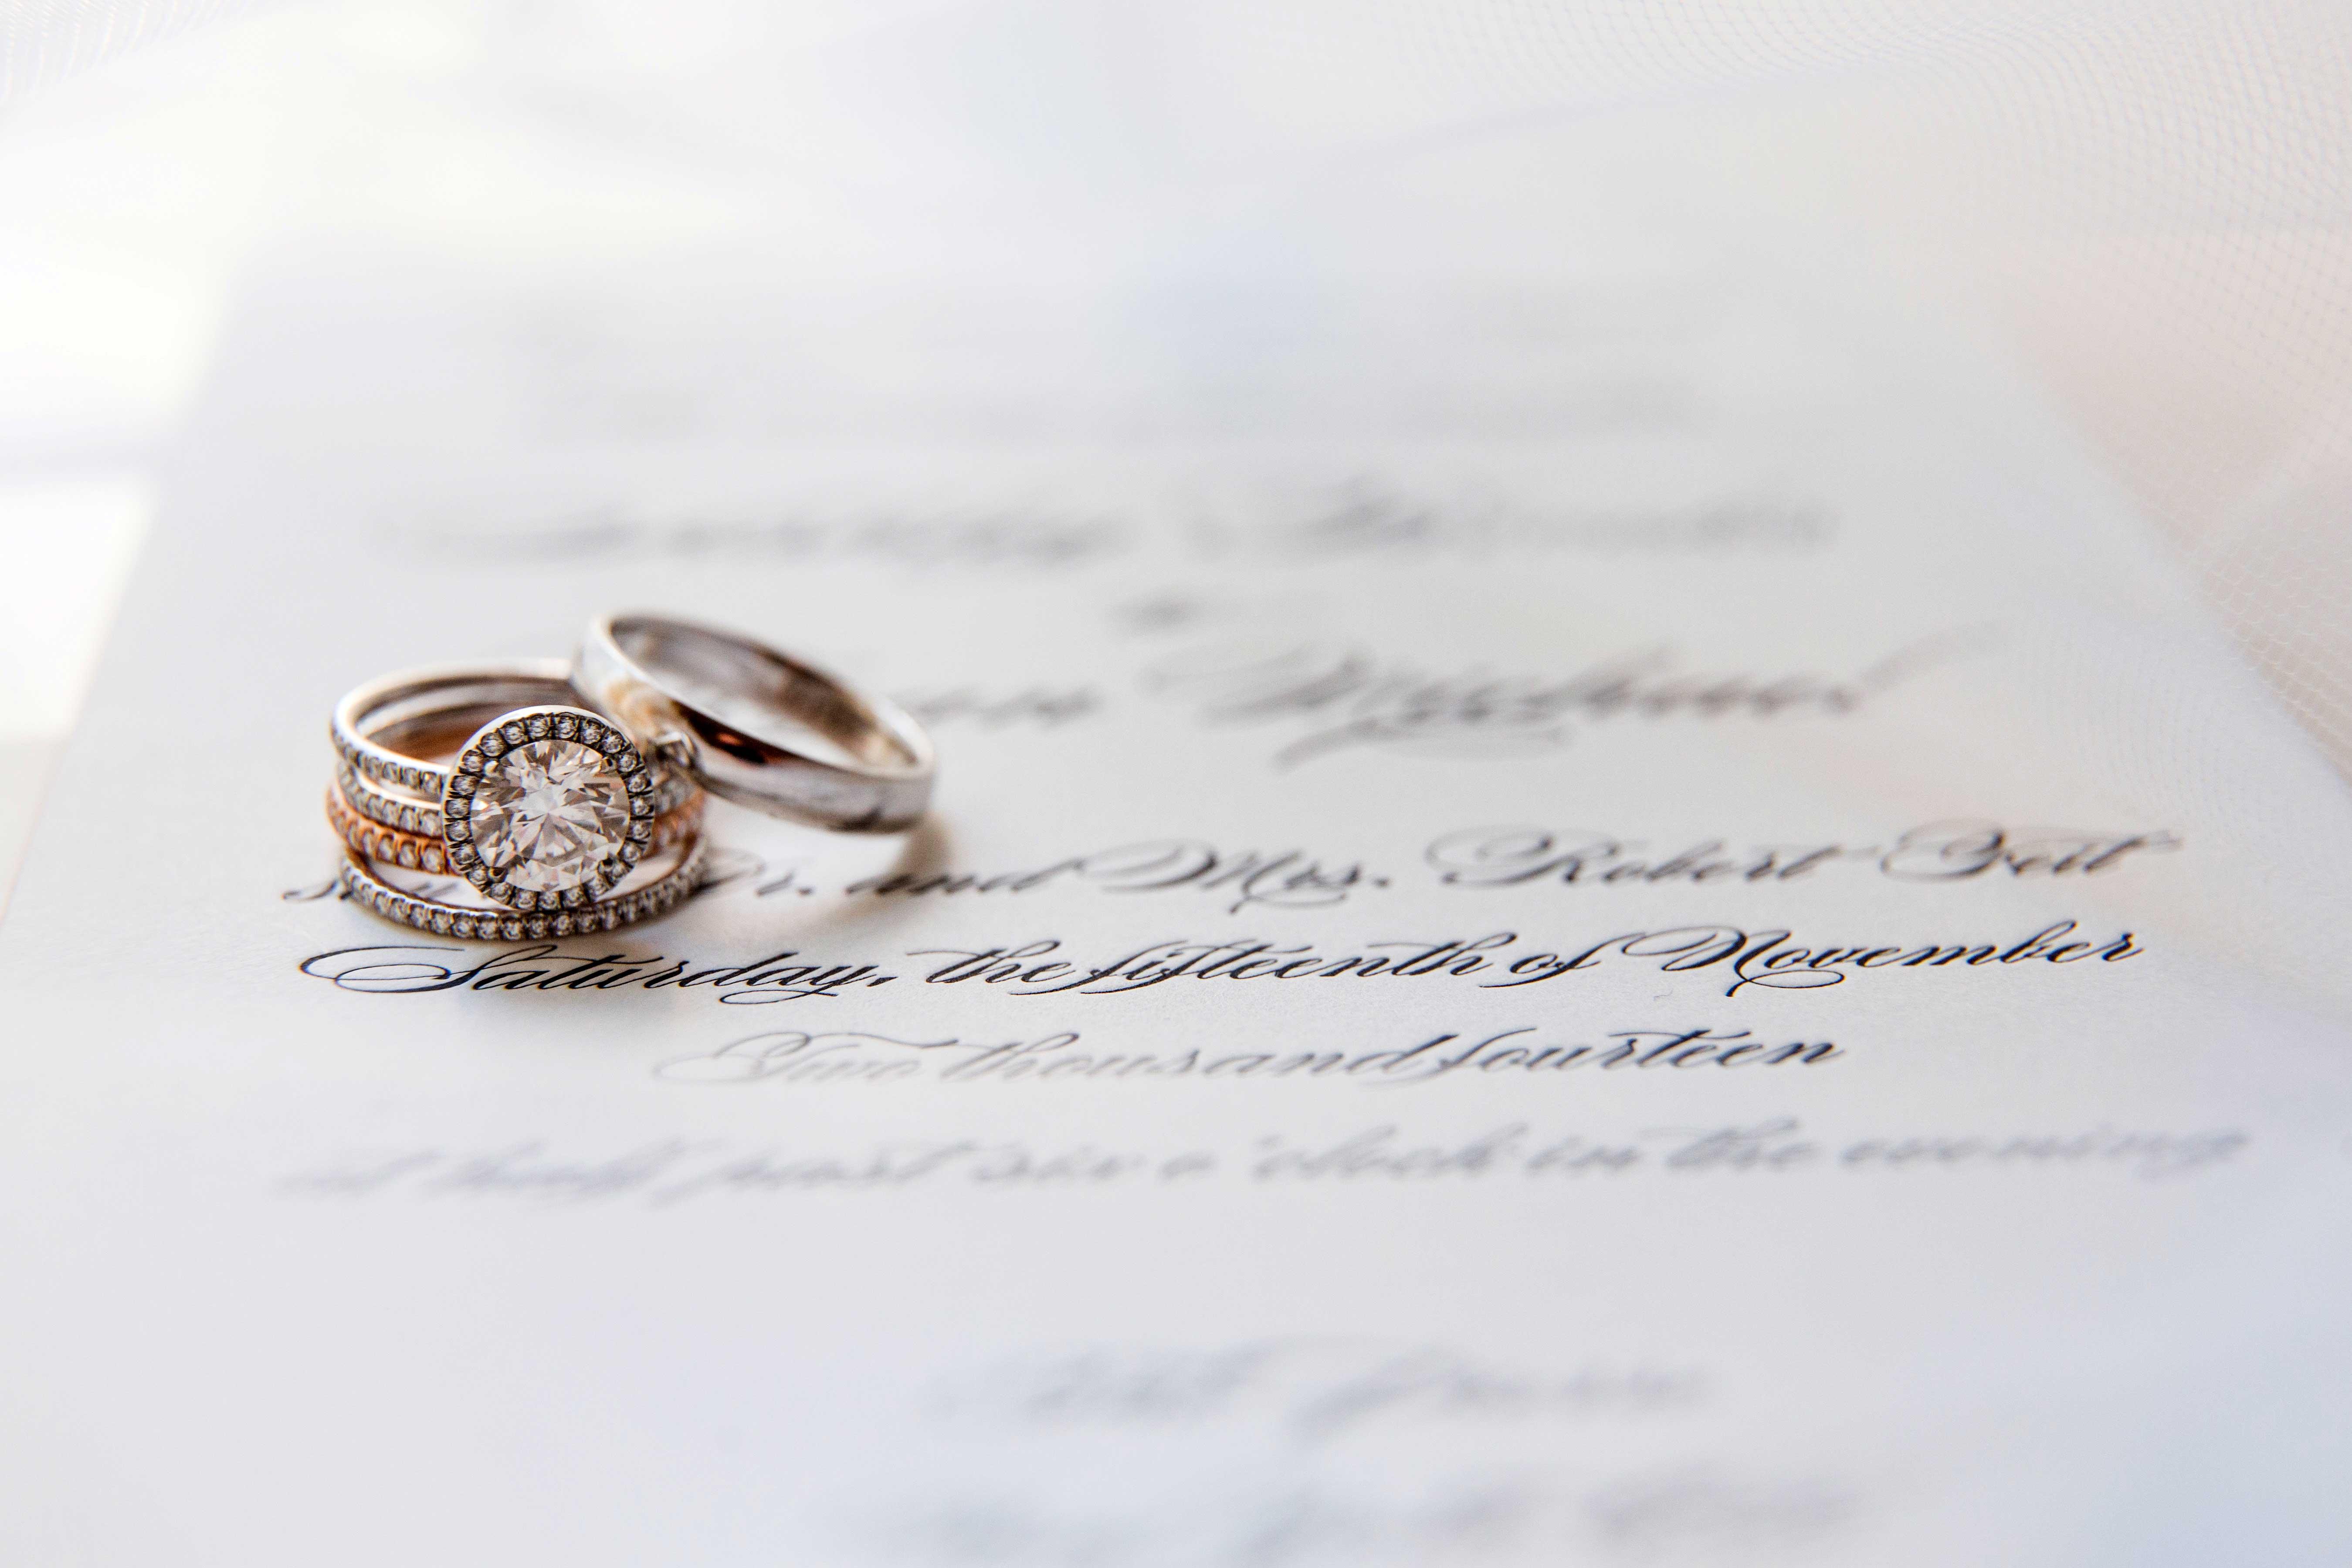 harry potter wedding bands Matthew Lewis engaged engagement ring inspiration round halo diamond ring